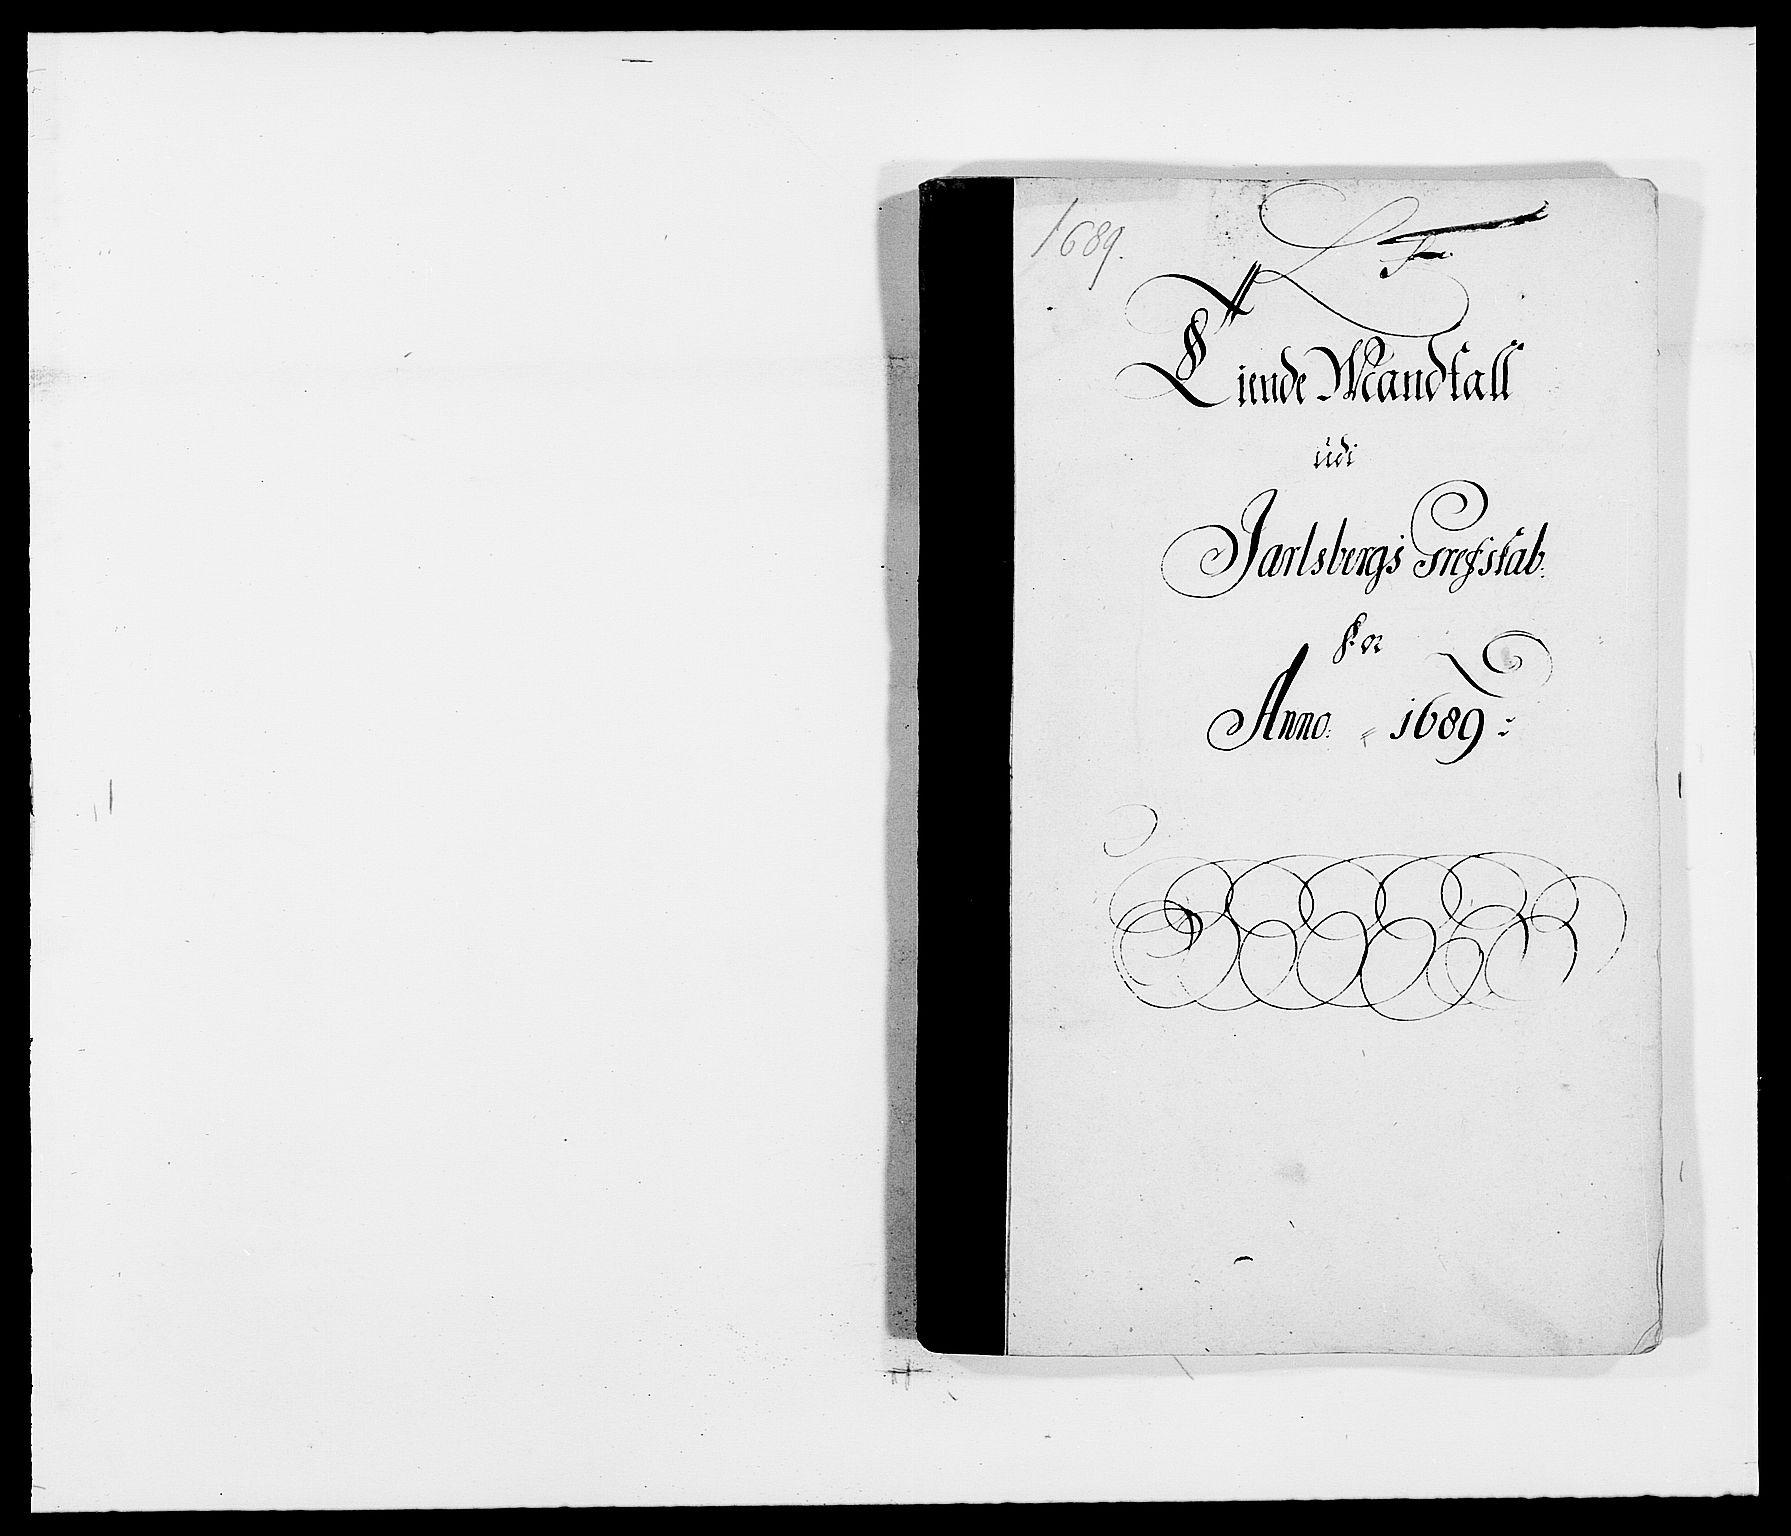 RA, Rentekammeret inntil 1814, Reviderte regnskaper, Fogderegnskap, R32/L1860: Fogderegnskap Jarlsberg grevskap, 1686-1690, s. 244